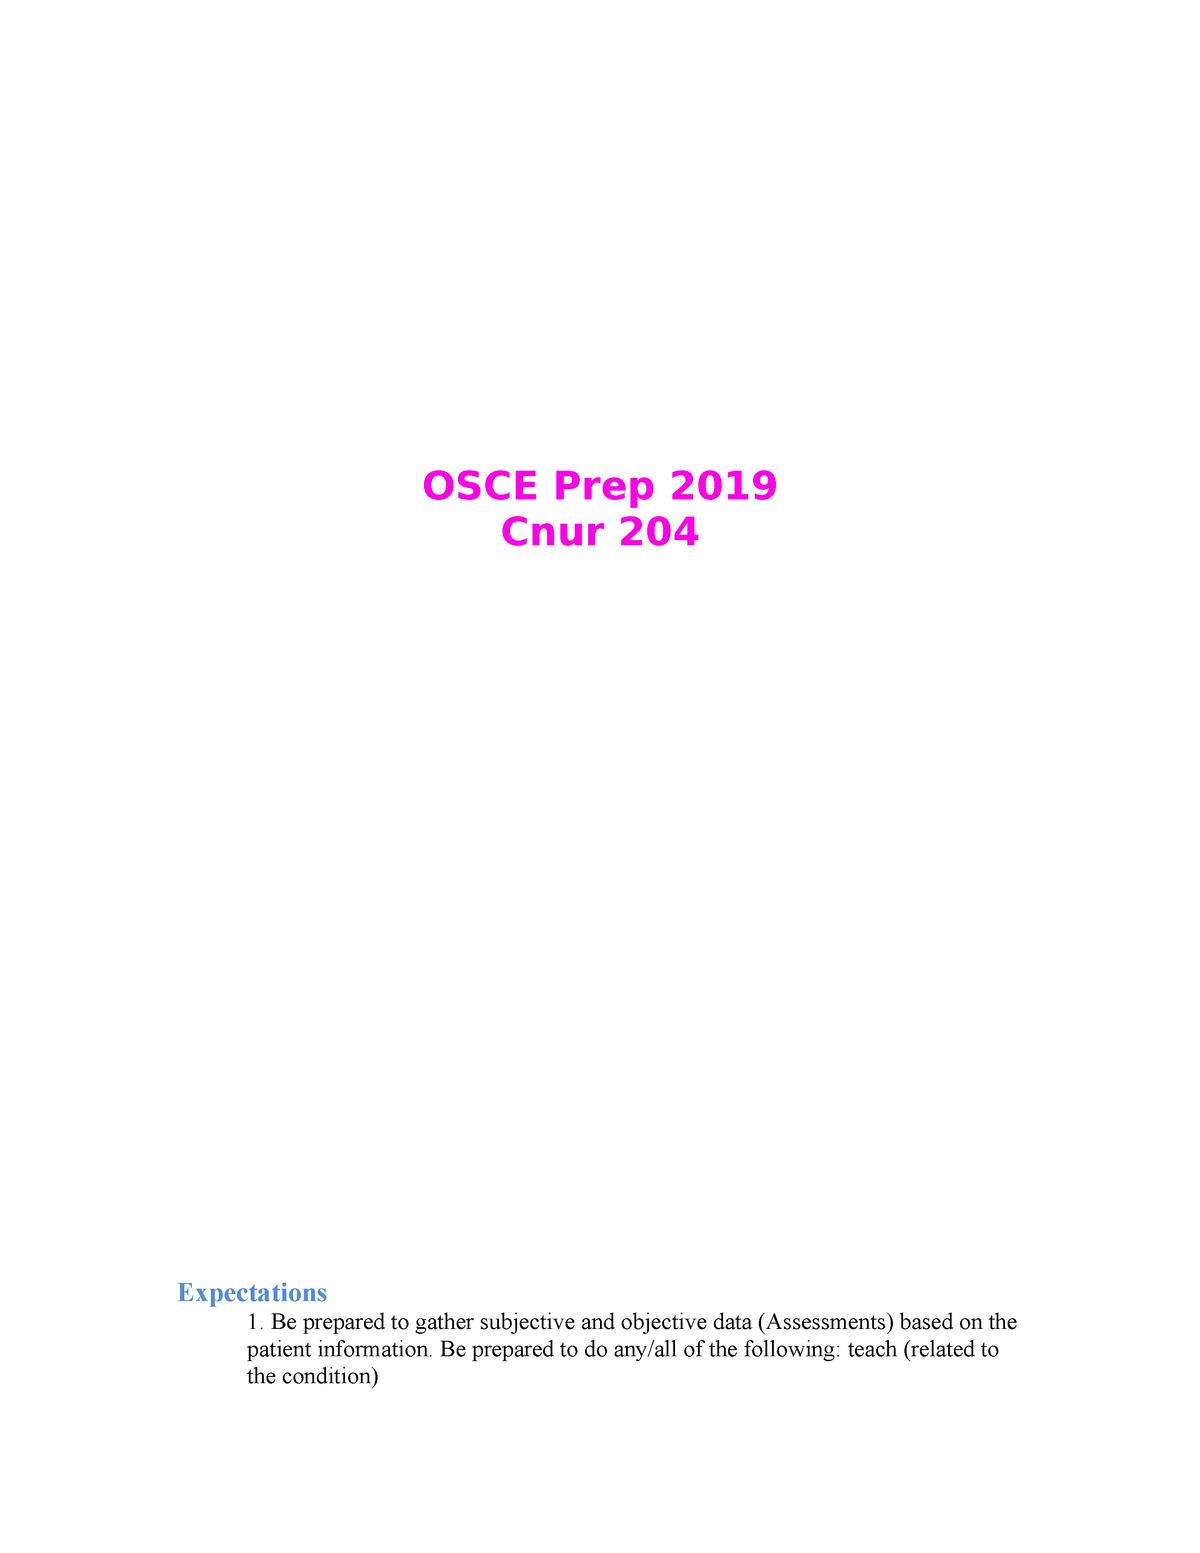 OSCE Prep 2019 - CNUR 204 Osce notes - CNUR 204: Alterations